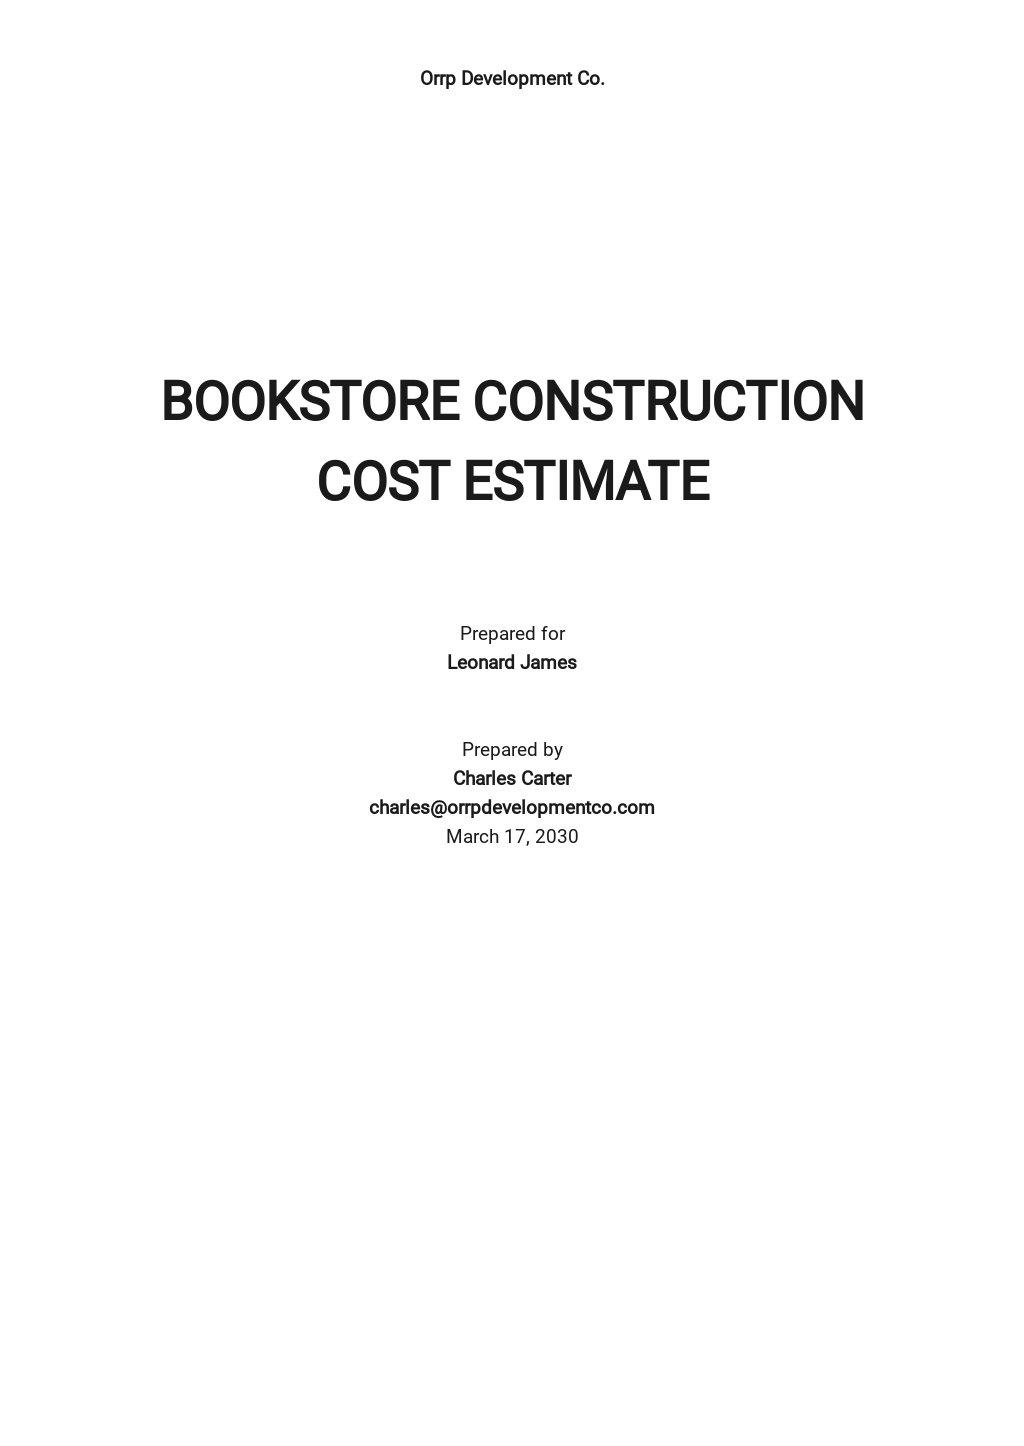 Sample Construction Cost Estimate Template